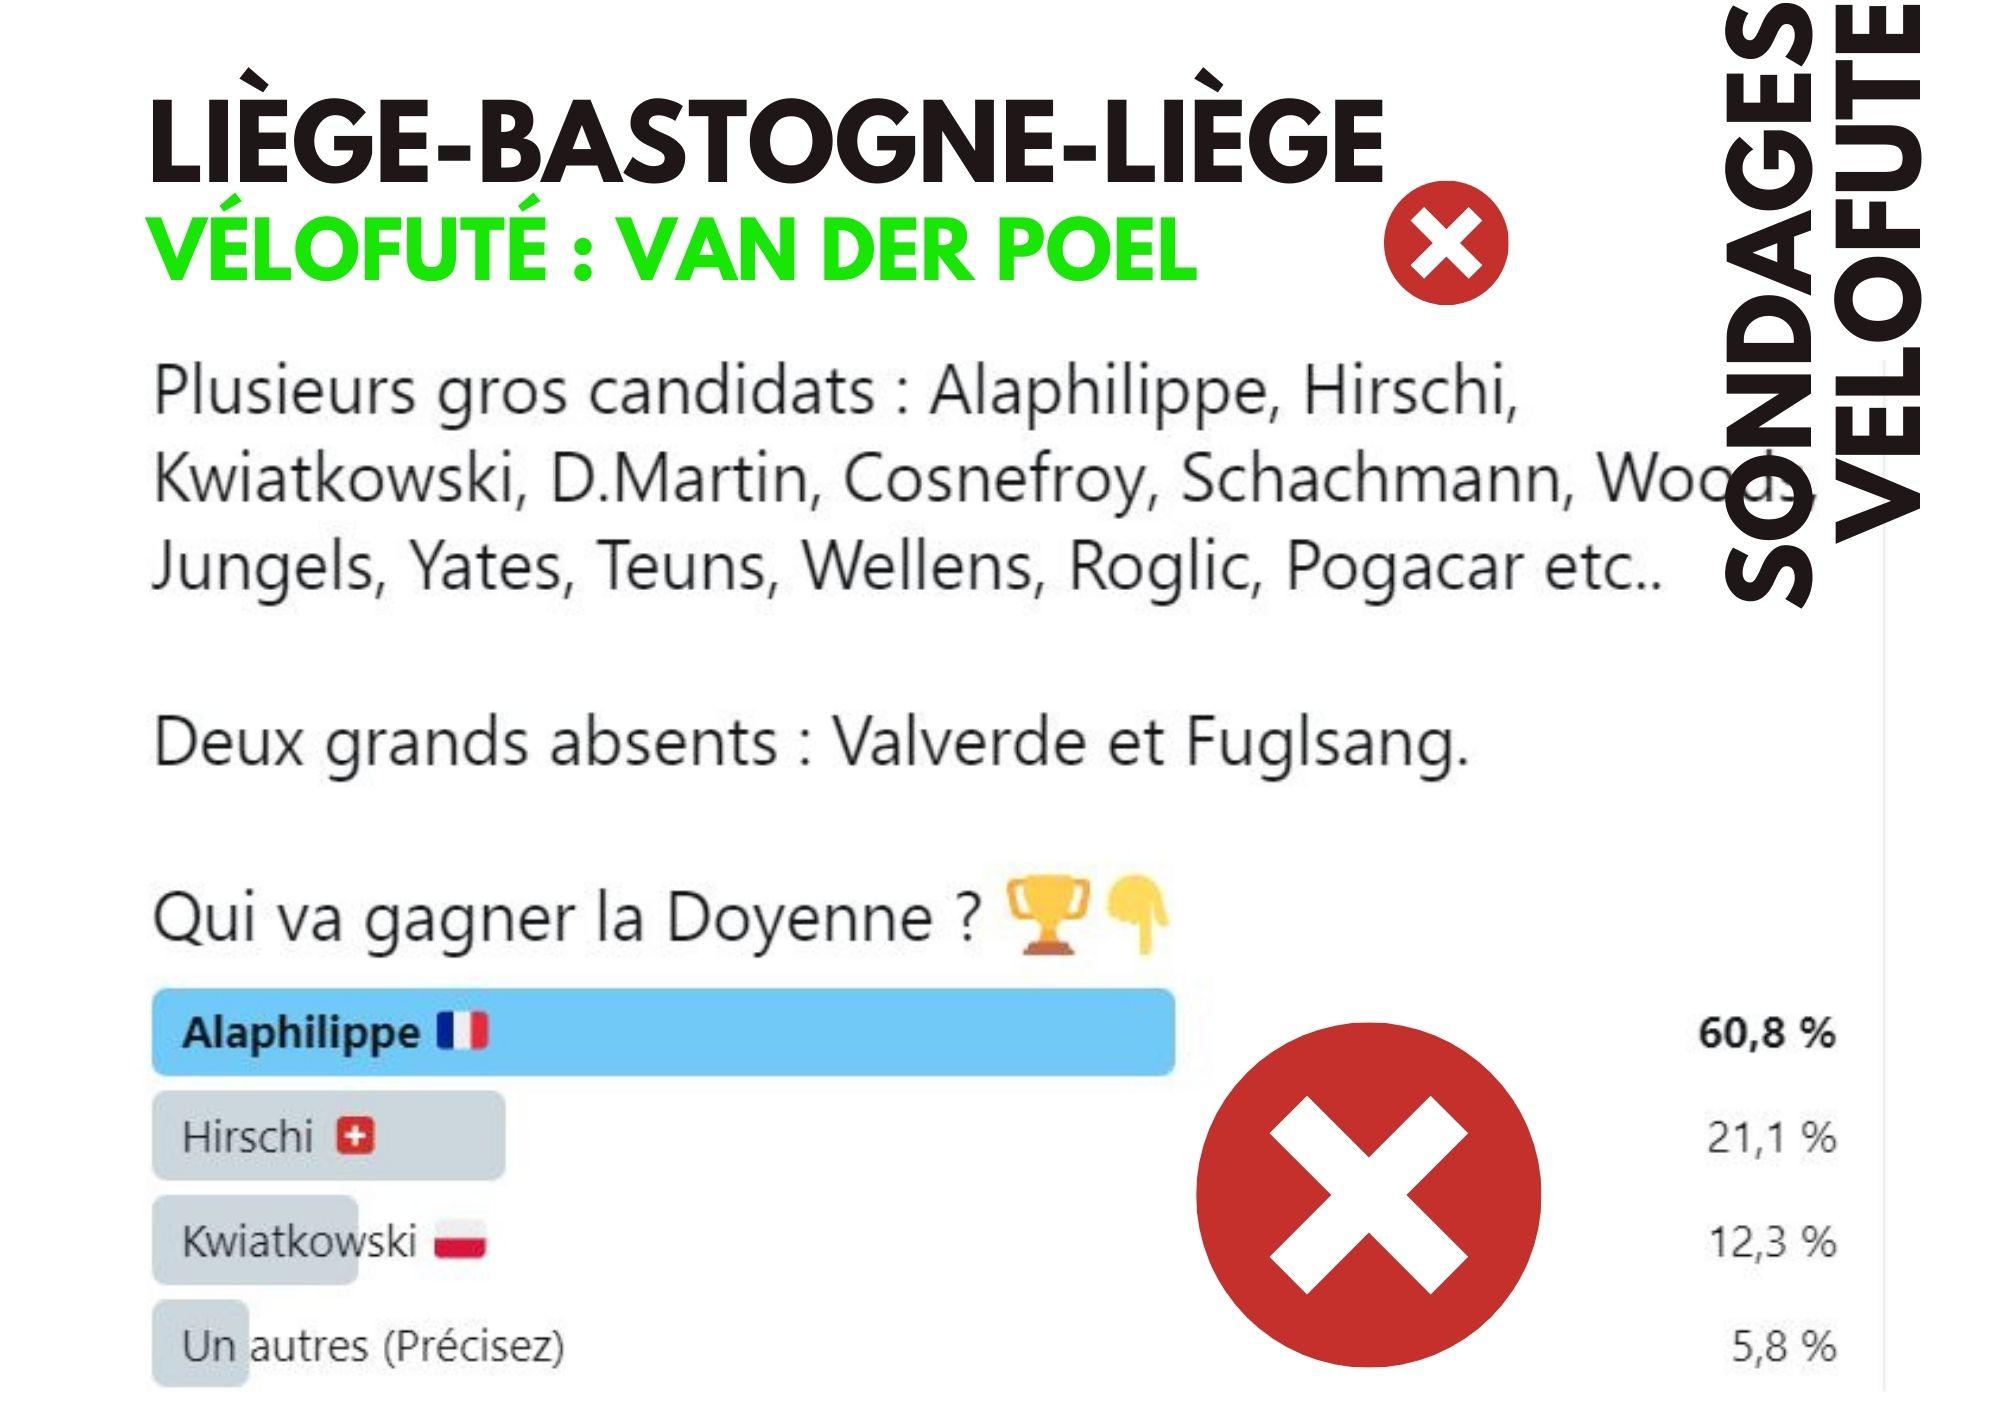 Liège sondage